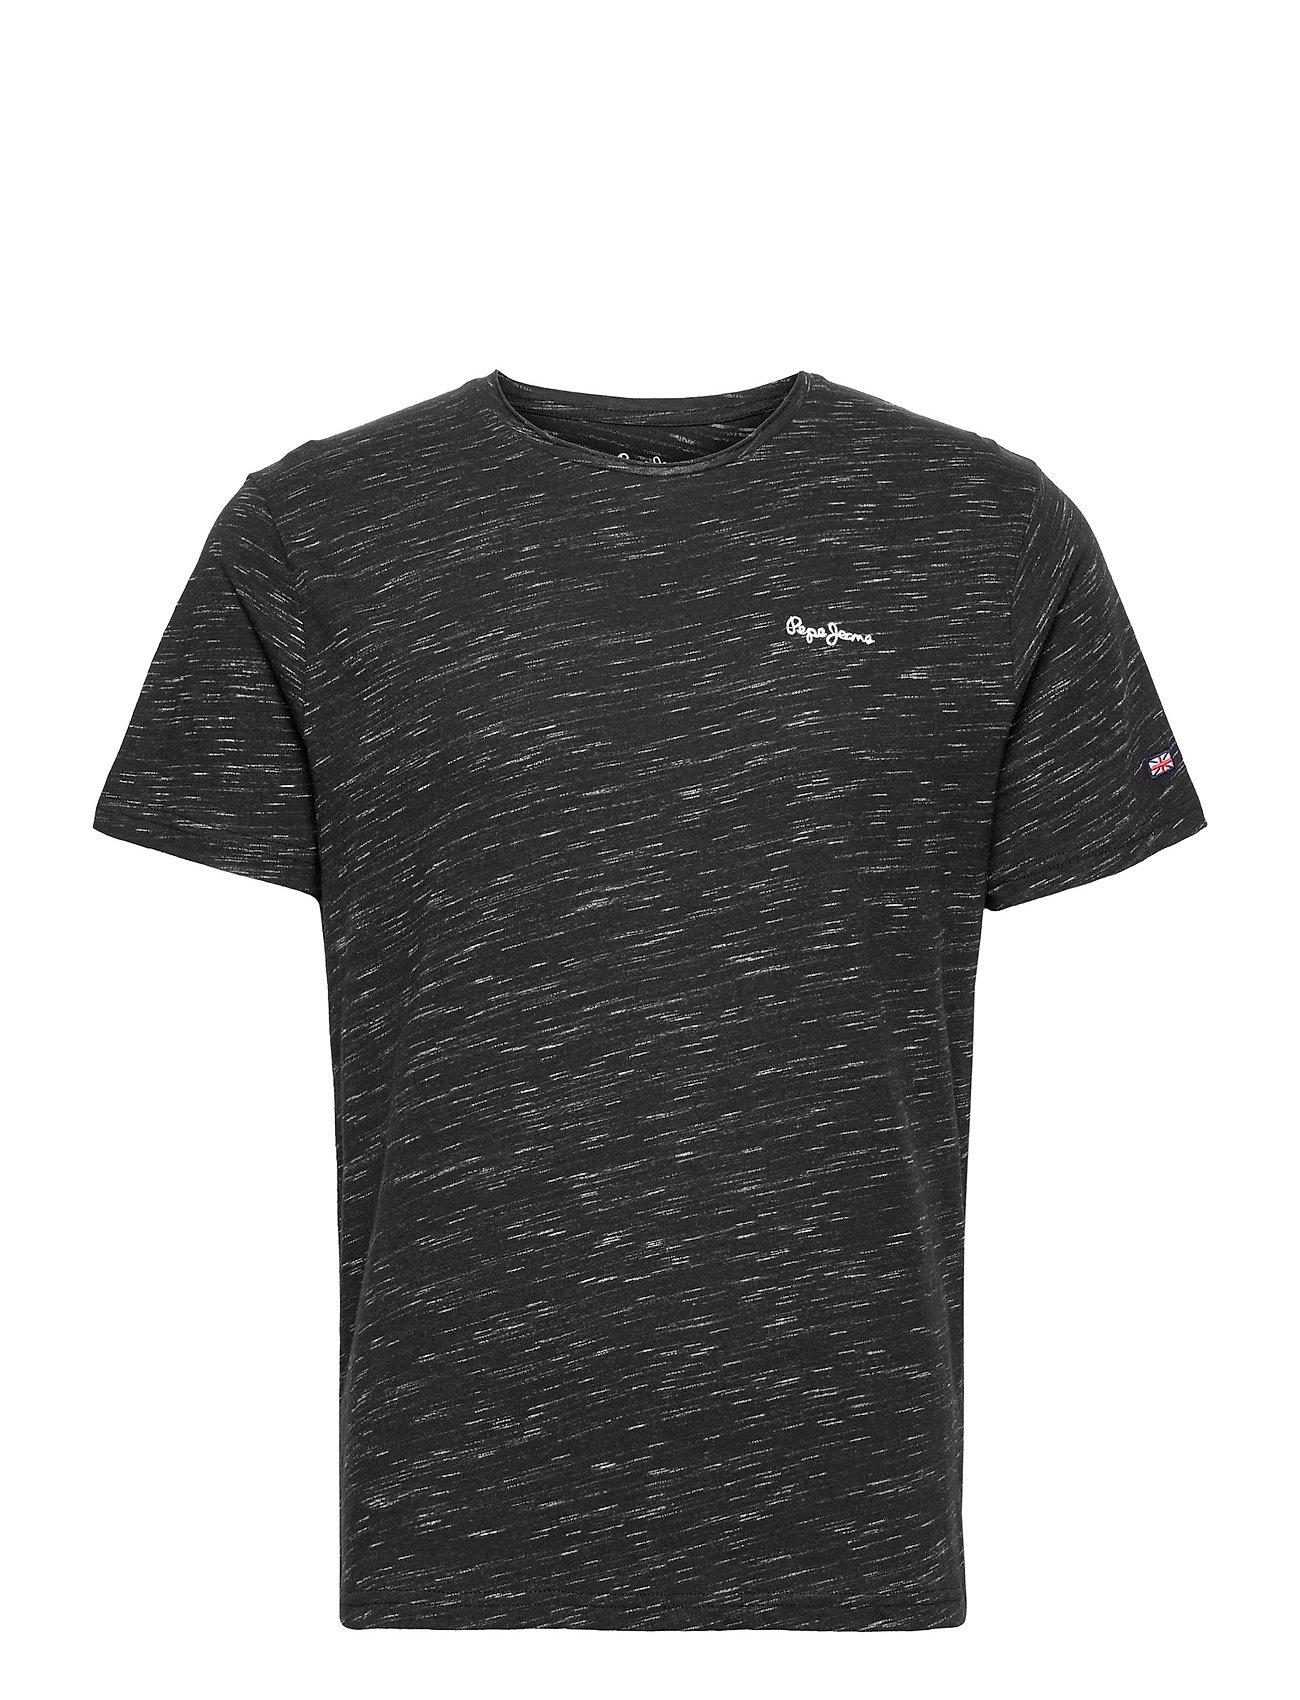 Image of Paul 4 T-shirt Grå Pepe Jeans London (3539795235)